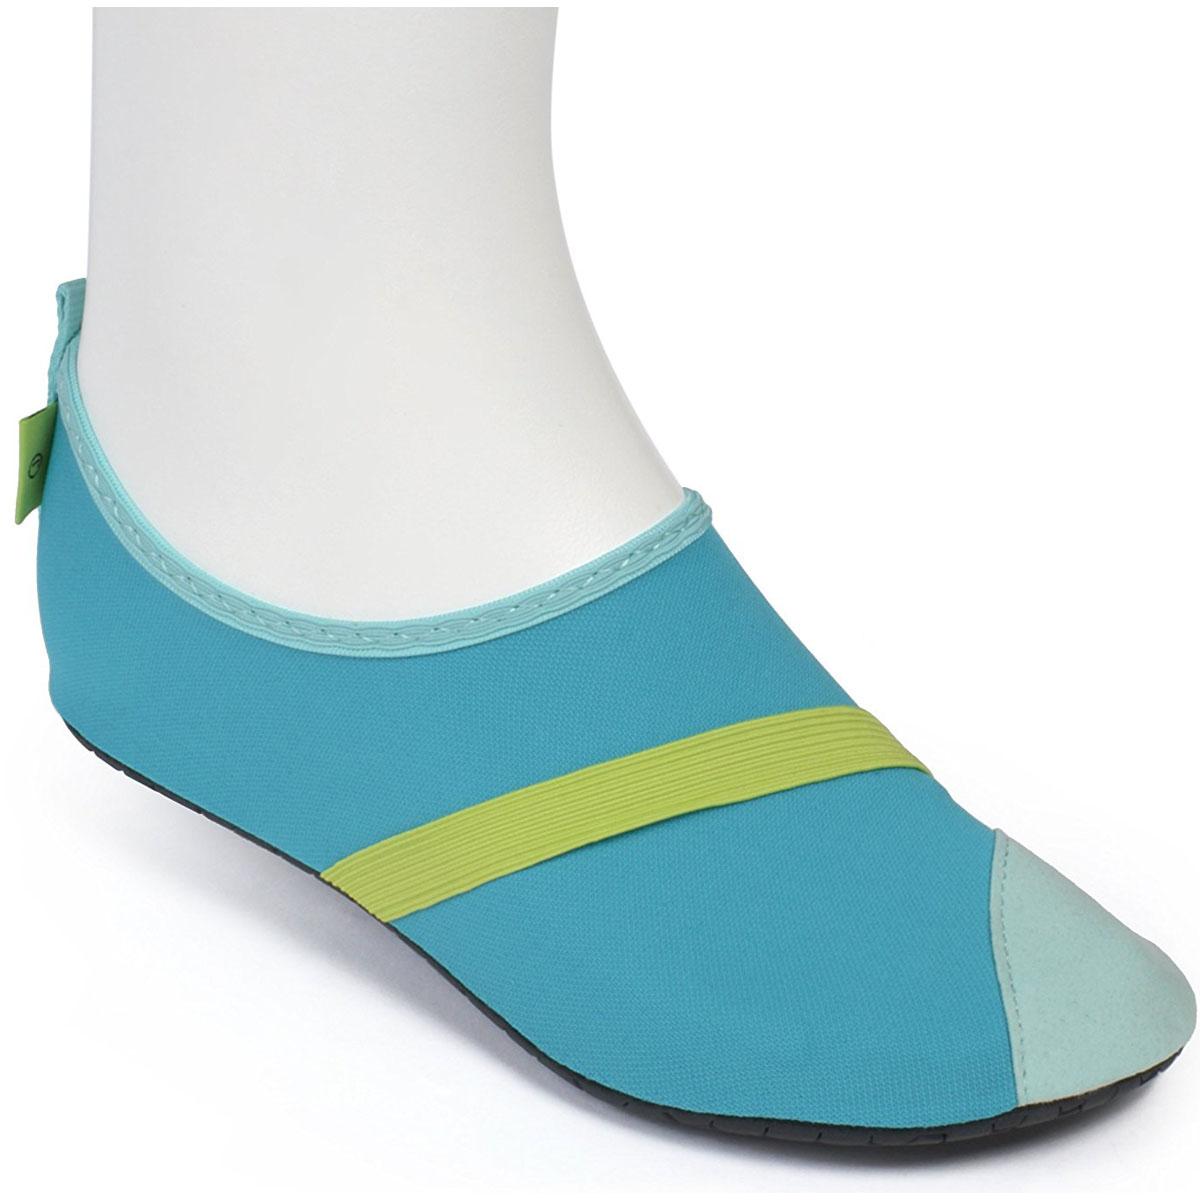 FitKicks-Women-039-s-Non-Slip-Sole-Active-Footwear thumbnail 35